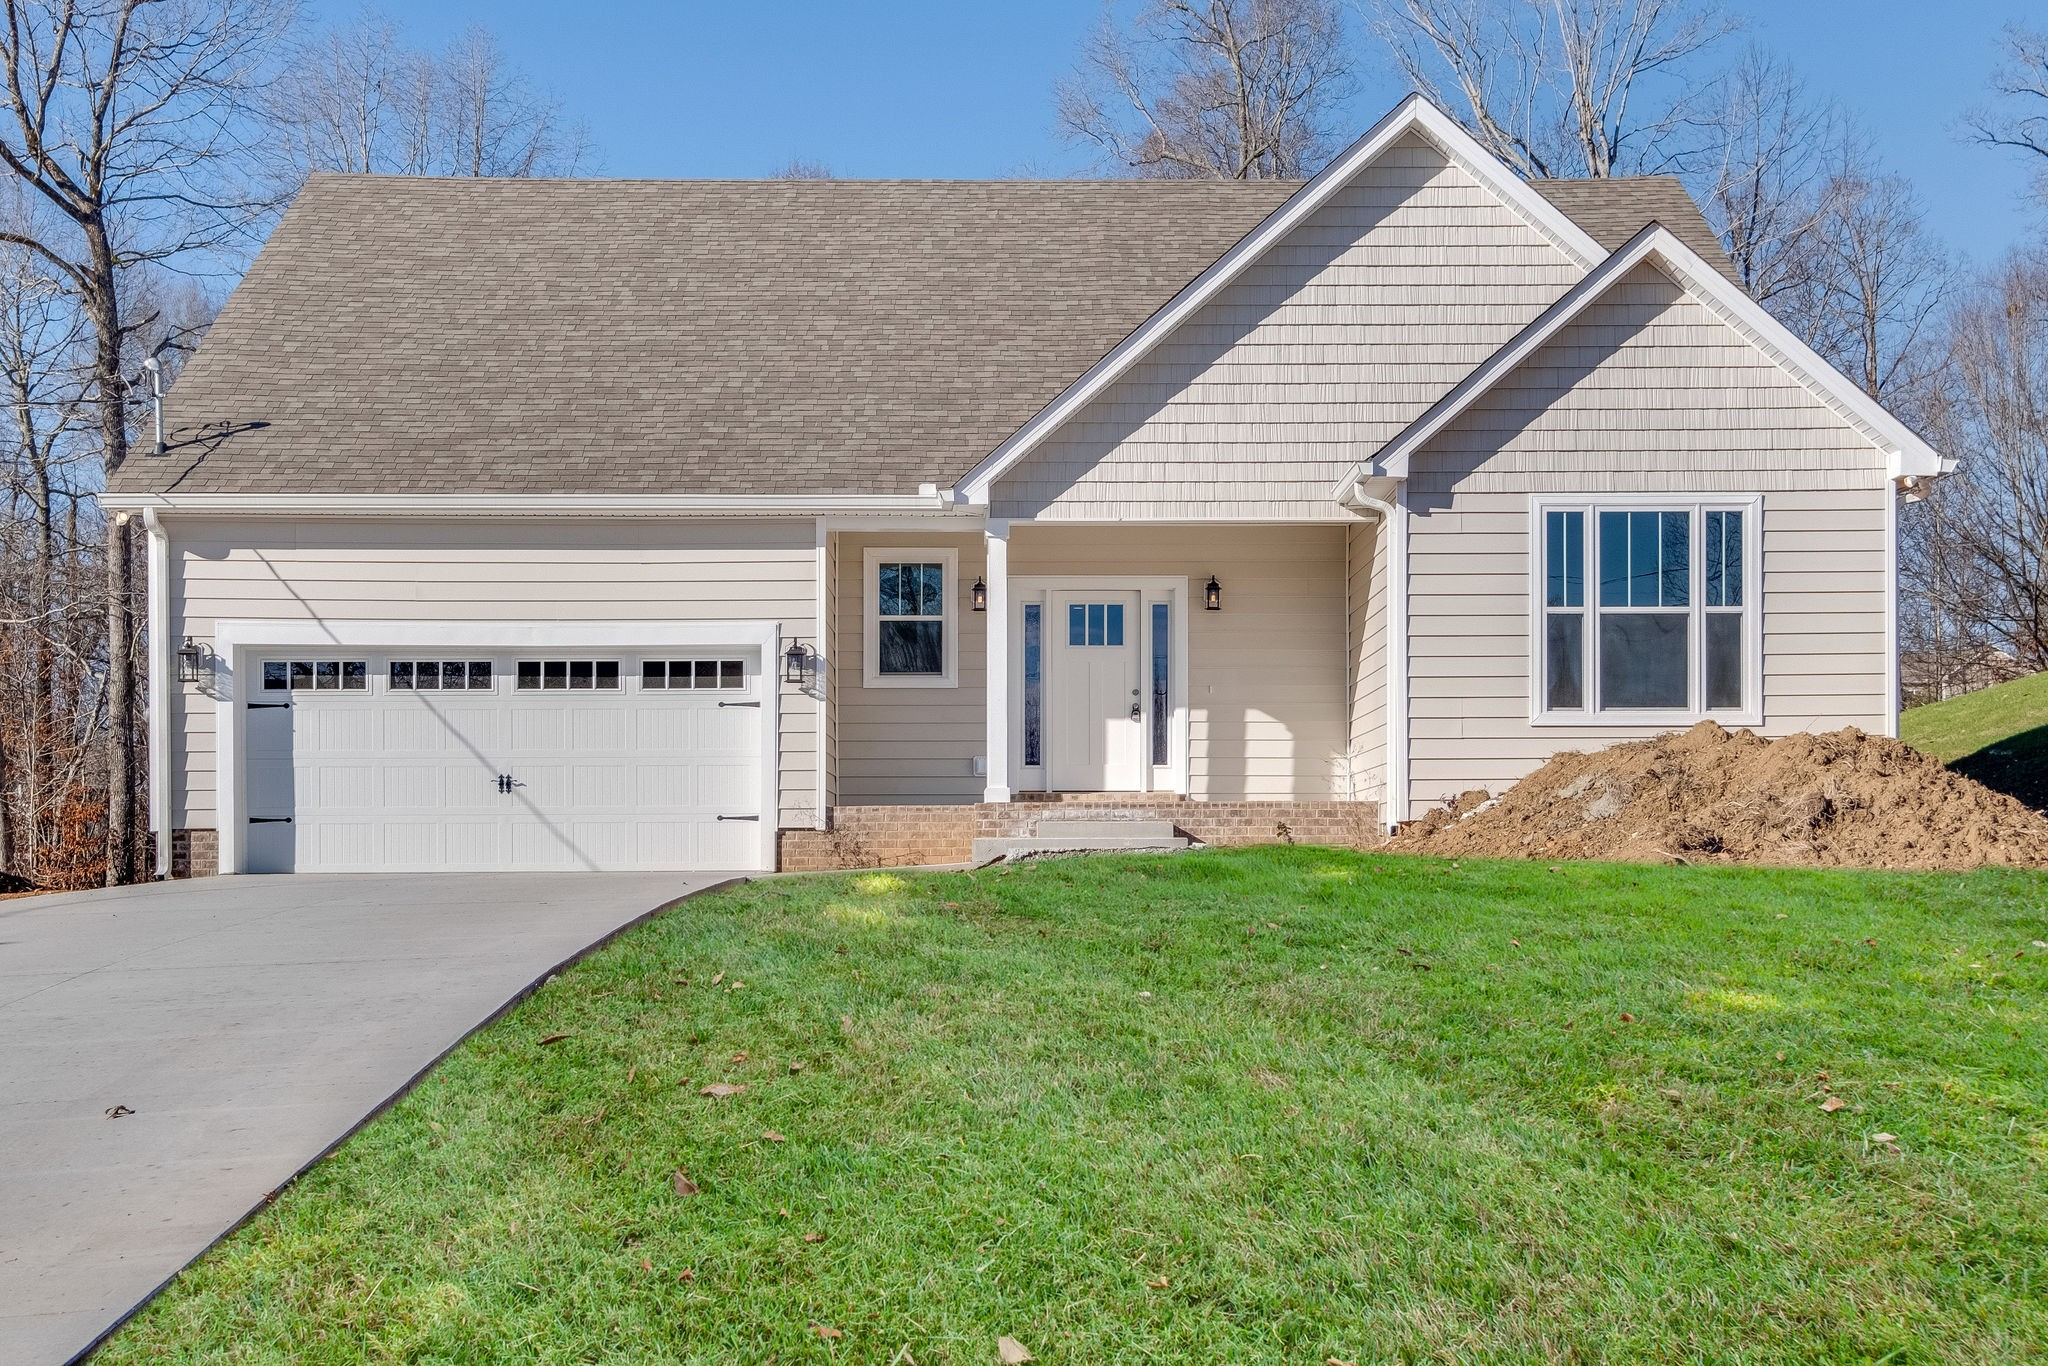 115 Laken Lane Lot 375, Dickson, TN 37055 - Dickson, TN real estate listing